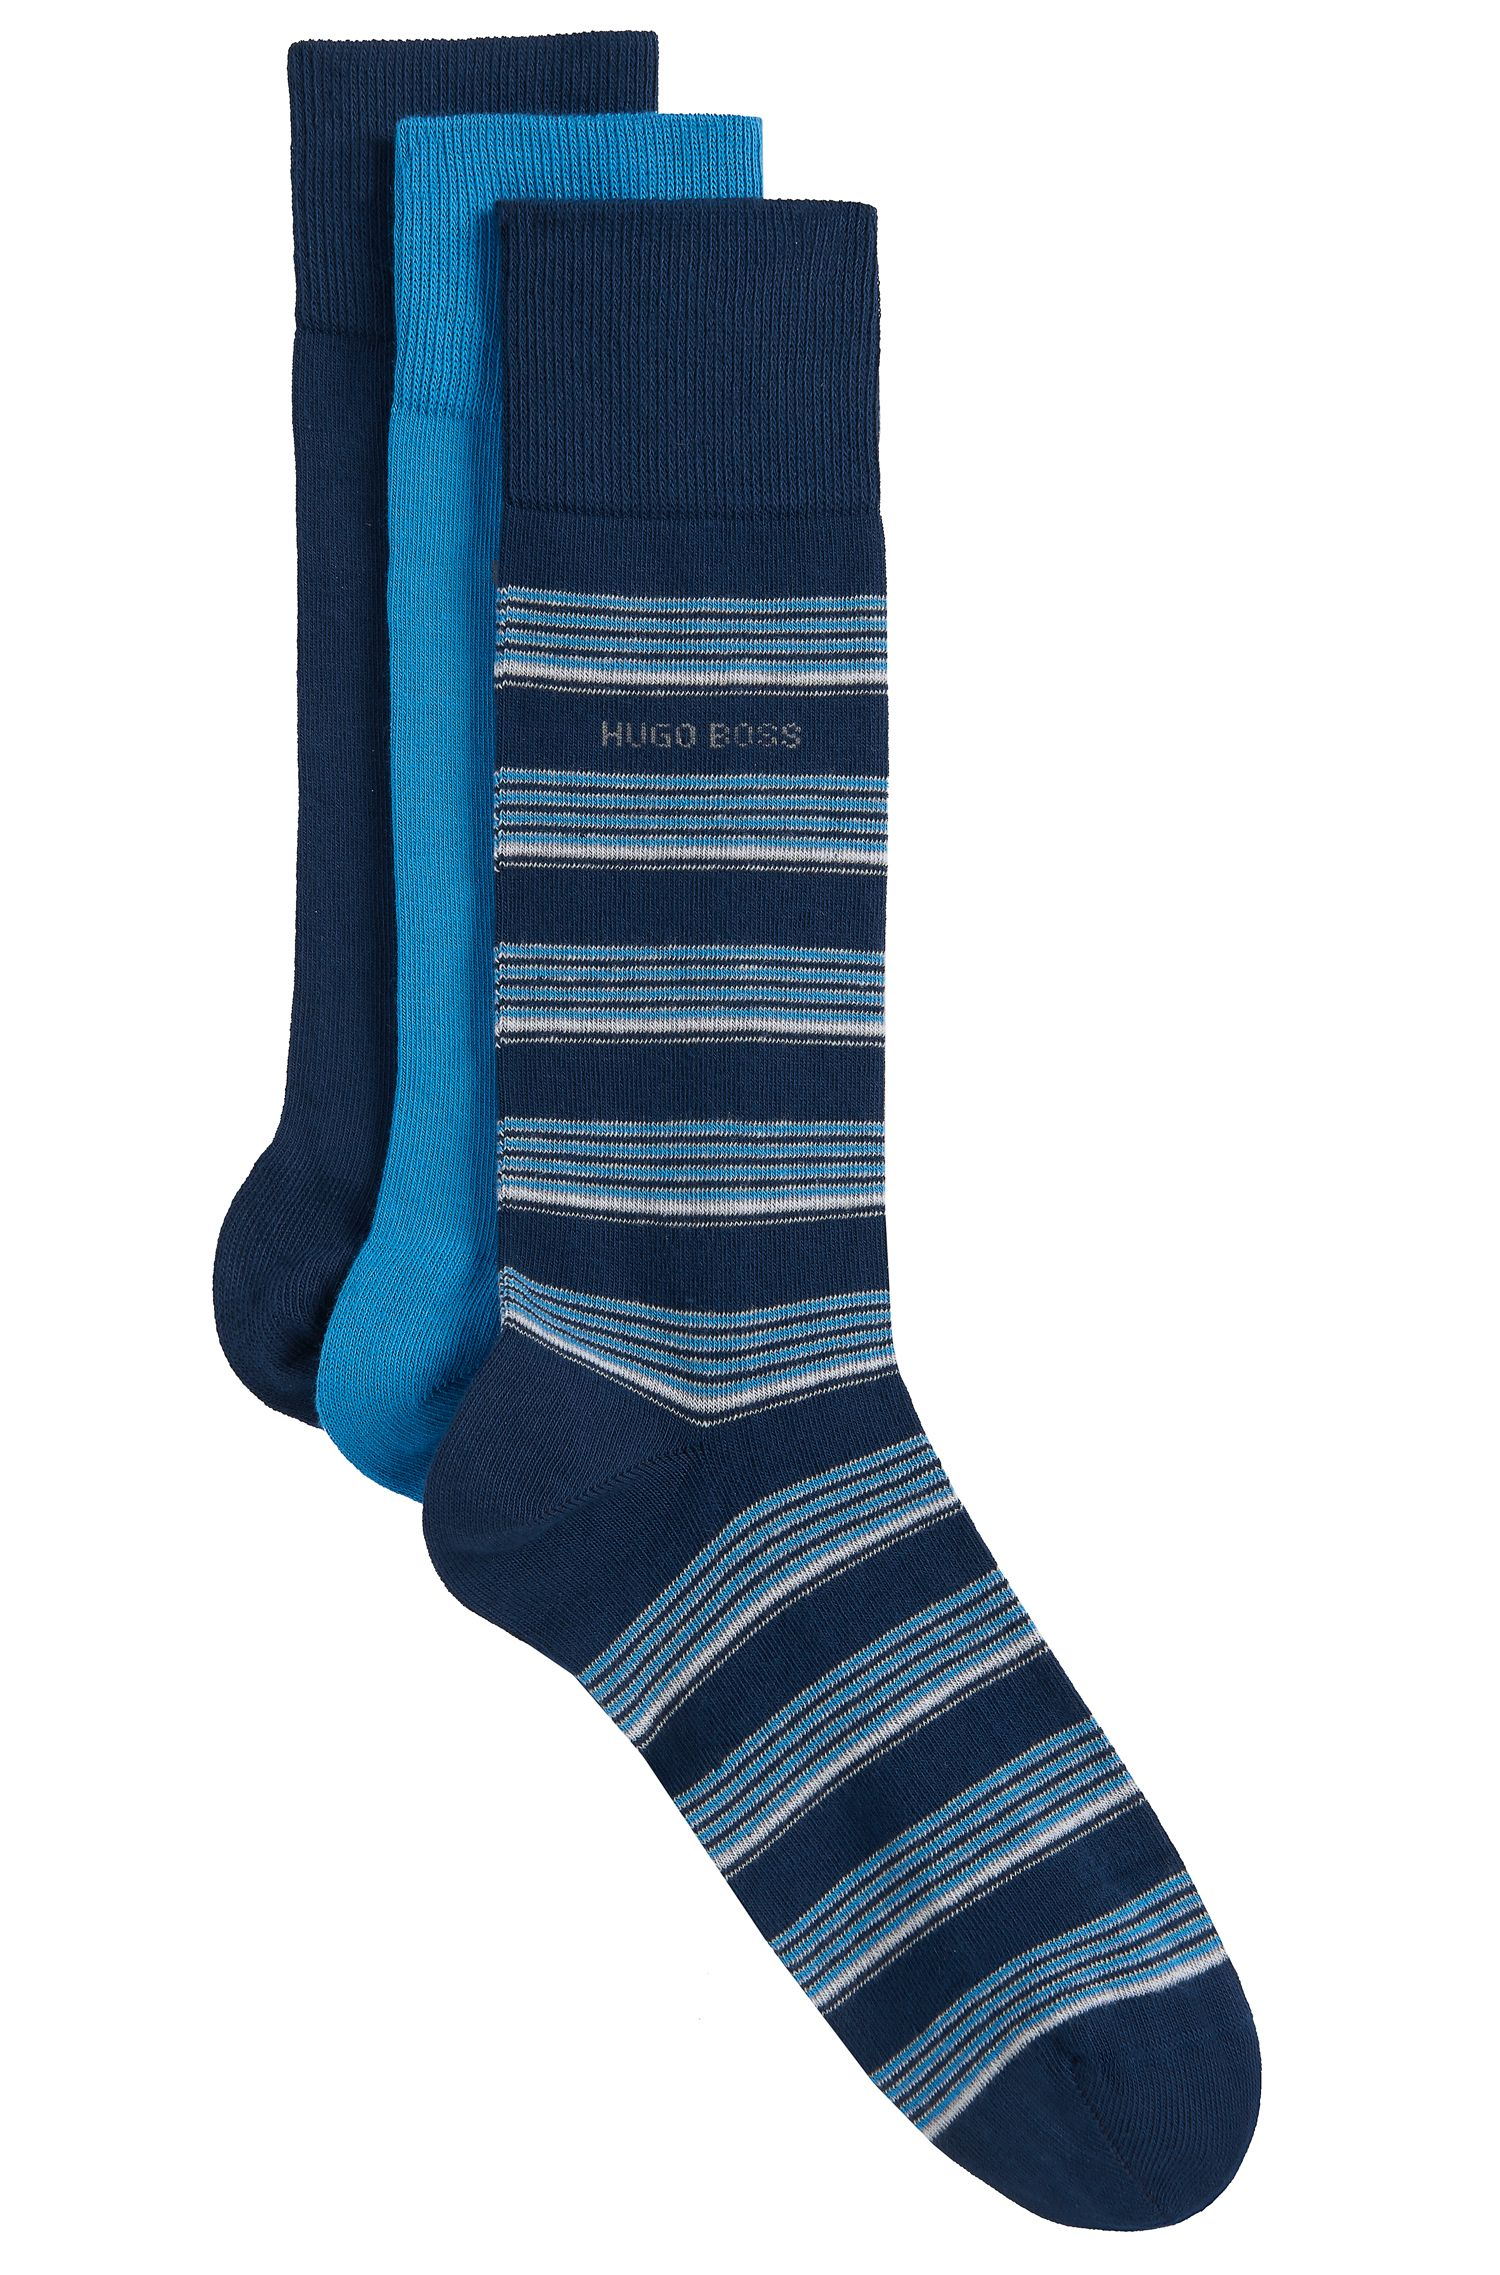 'S Design Box Us' | Stretch Cotton Blend Socks, 3 Pack